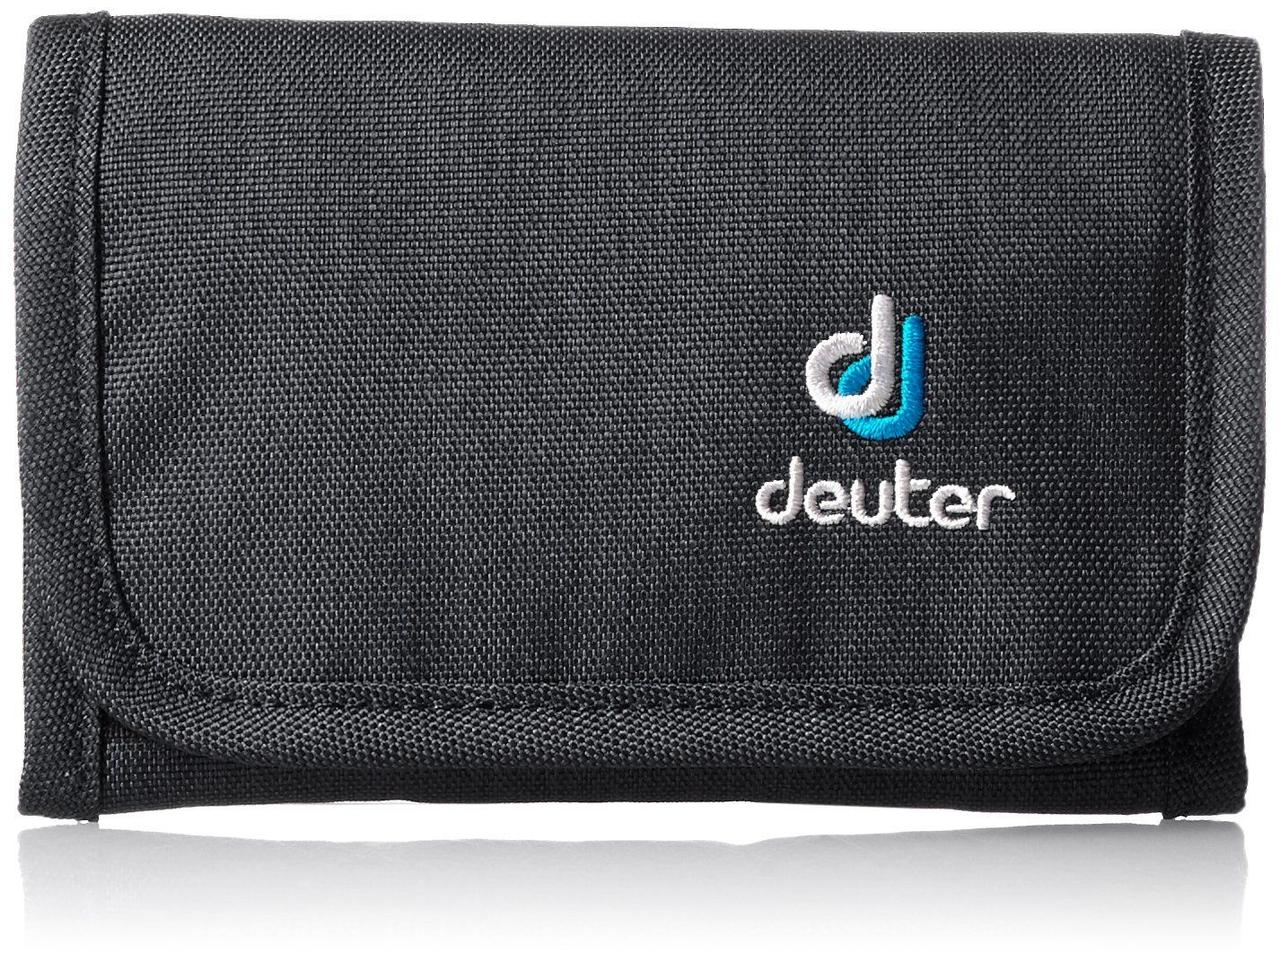 Кошелек Deuter Travel Wallet dresscode (3942616 7013)